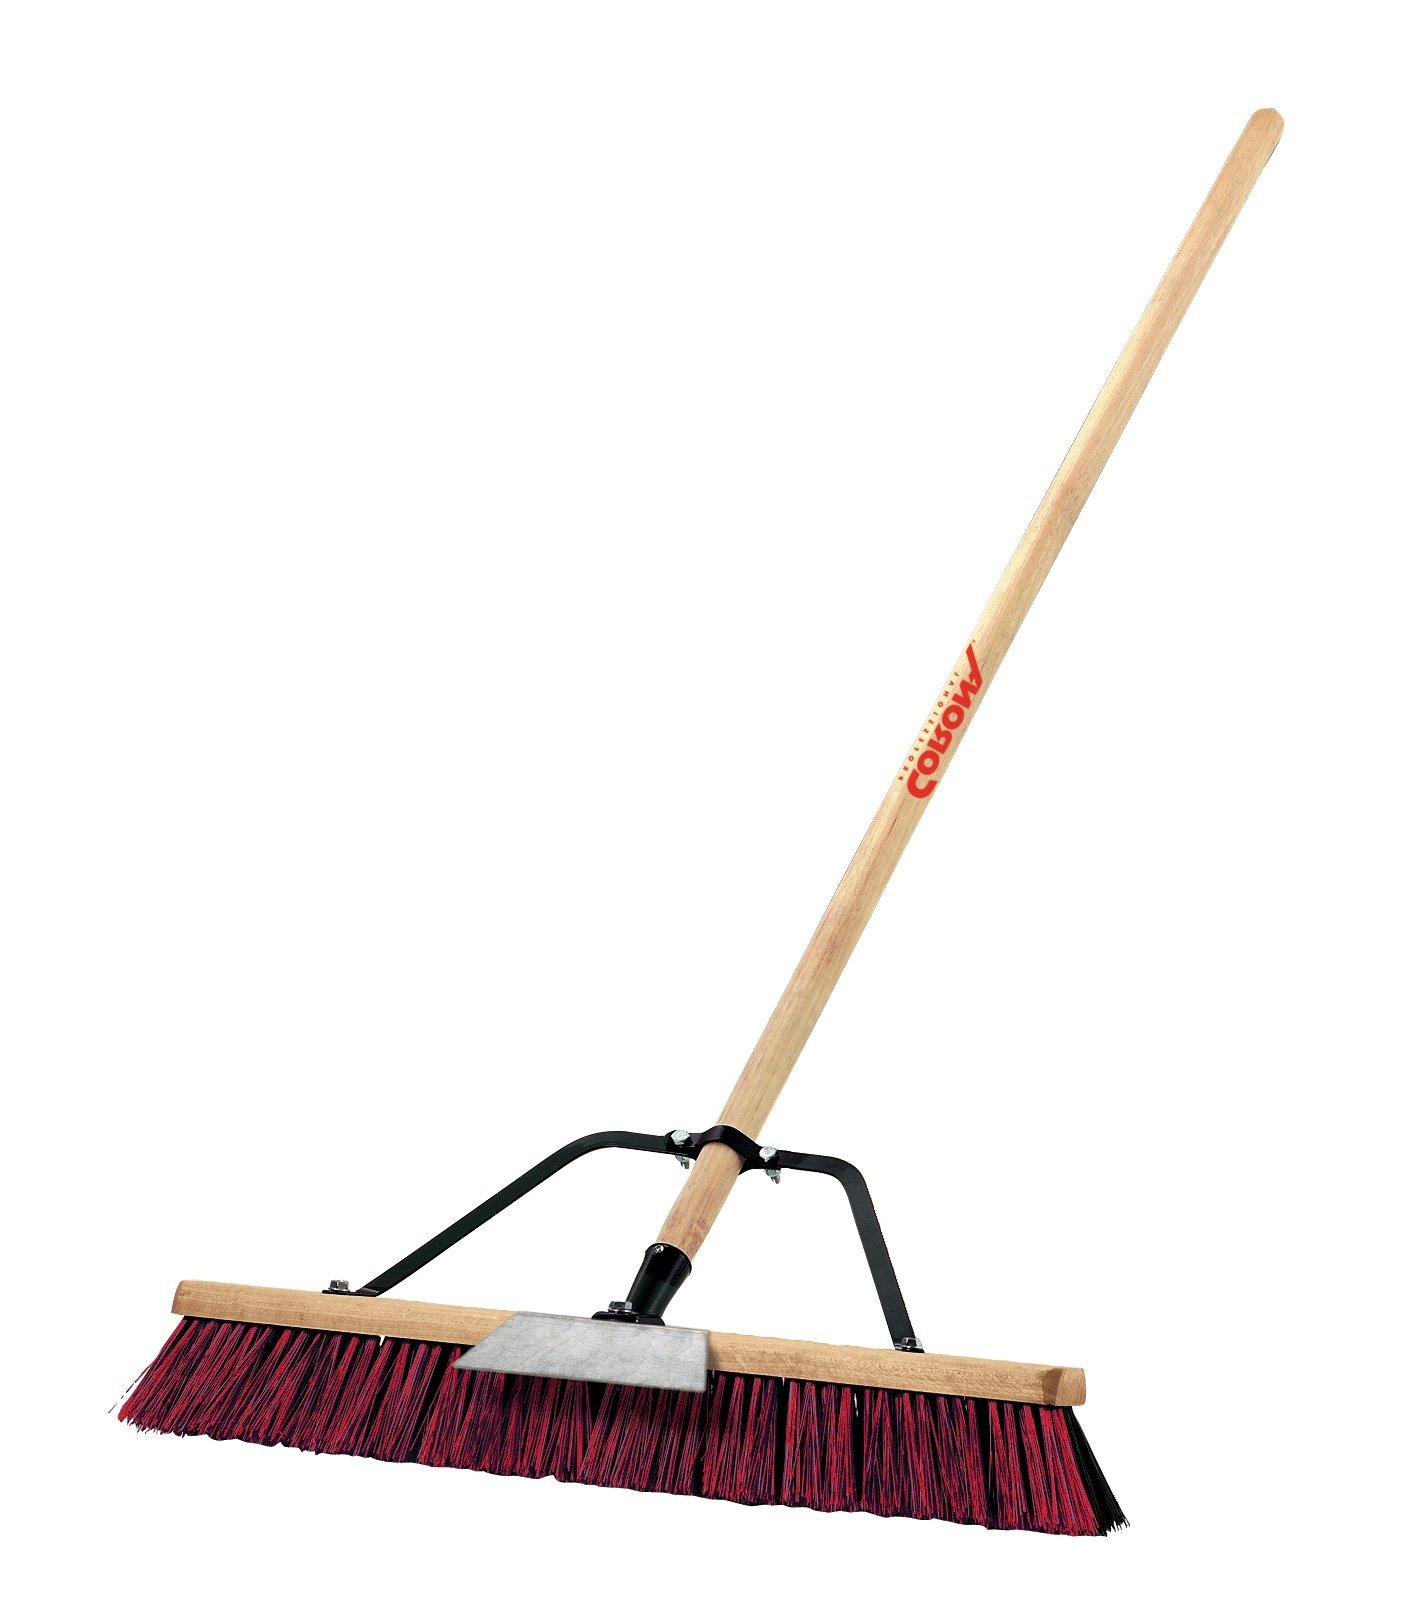 Corona BM 61002 Push Broom, 2 Bristles, 24-Inch Wide by Corona